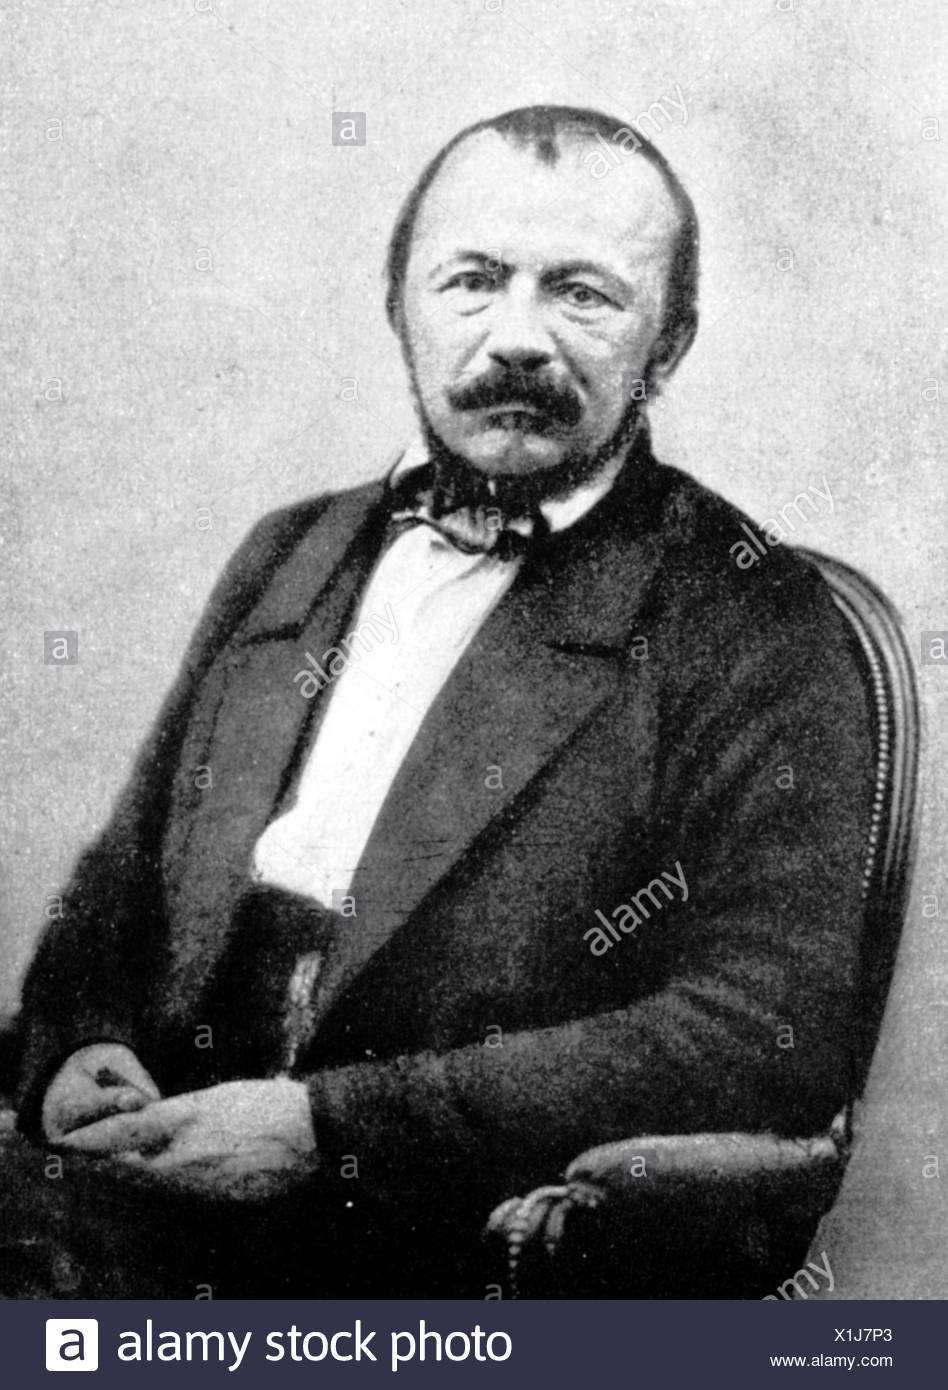 Gerard de Nerval aurelie